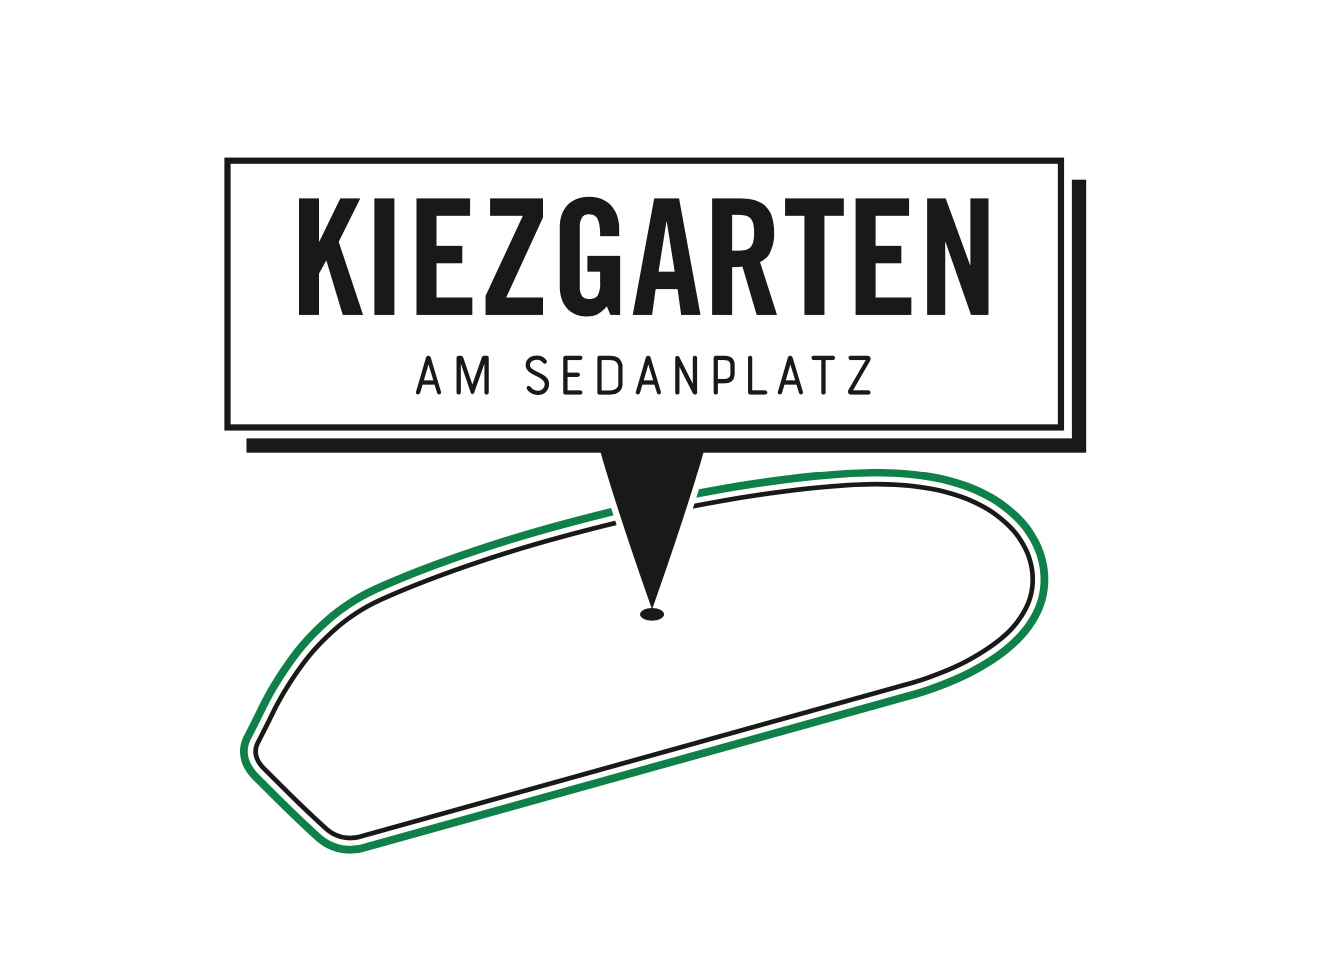 Kiezgarten final